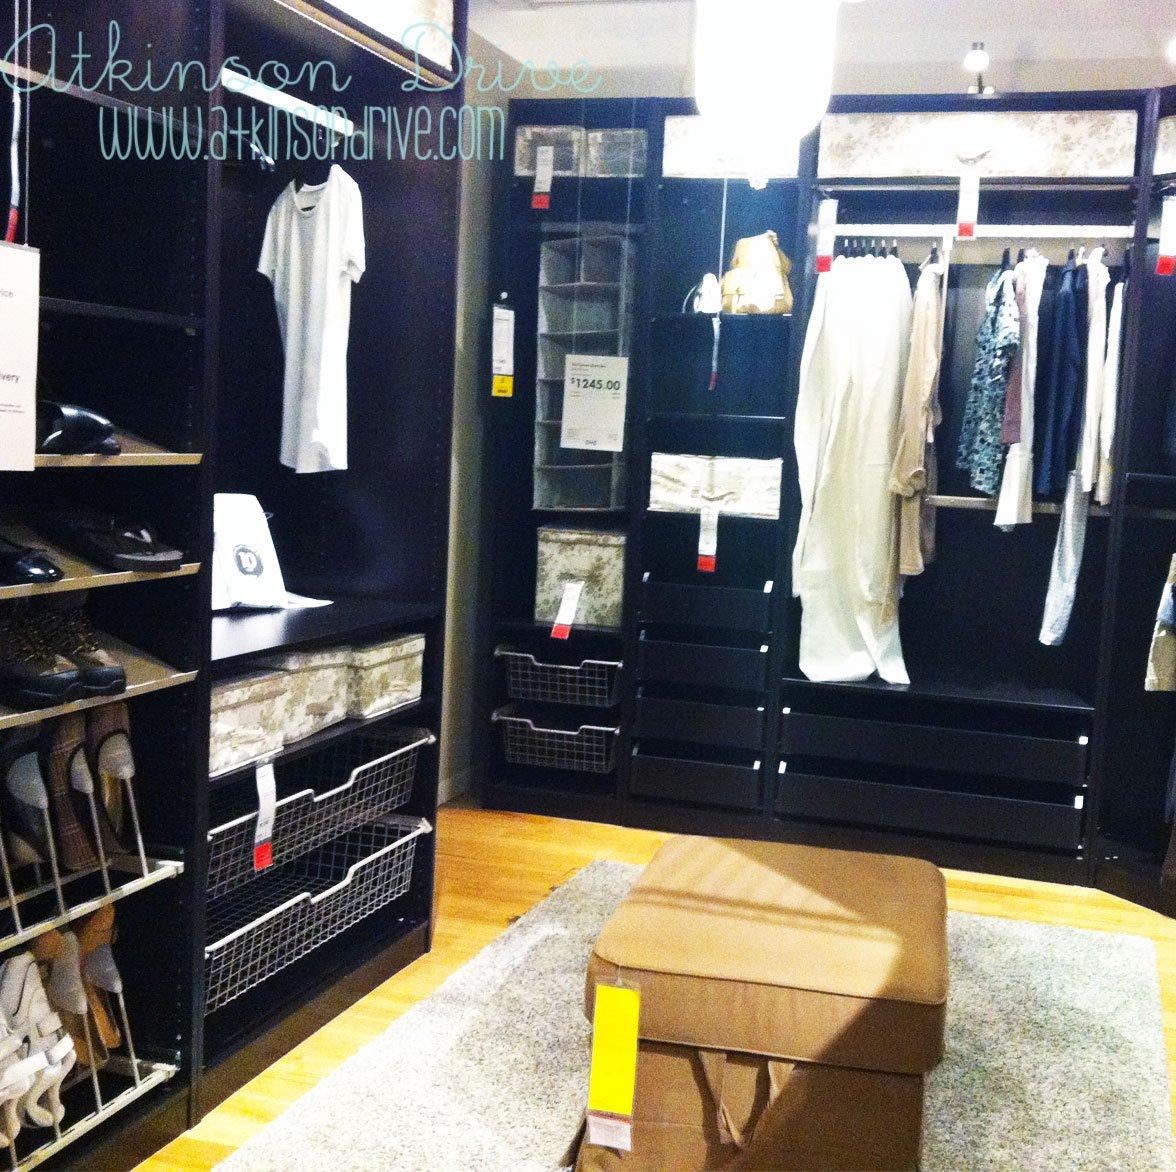 IKEA Finds – June 2012